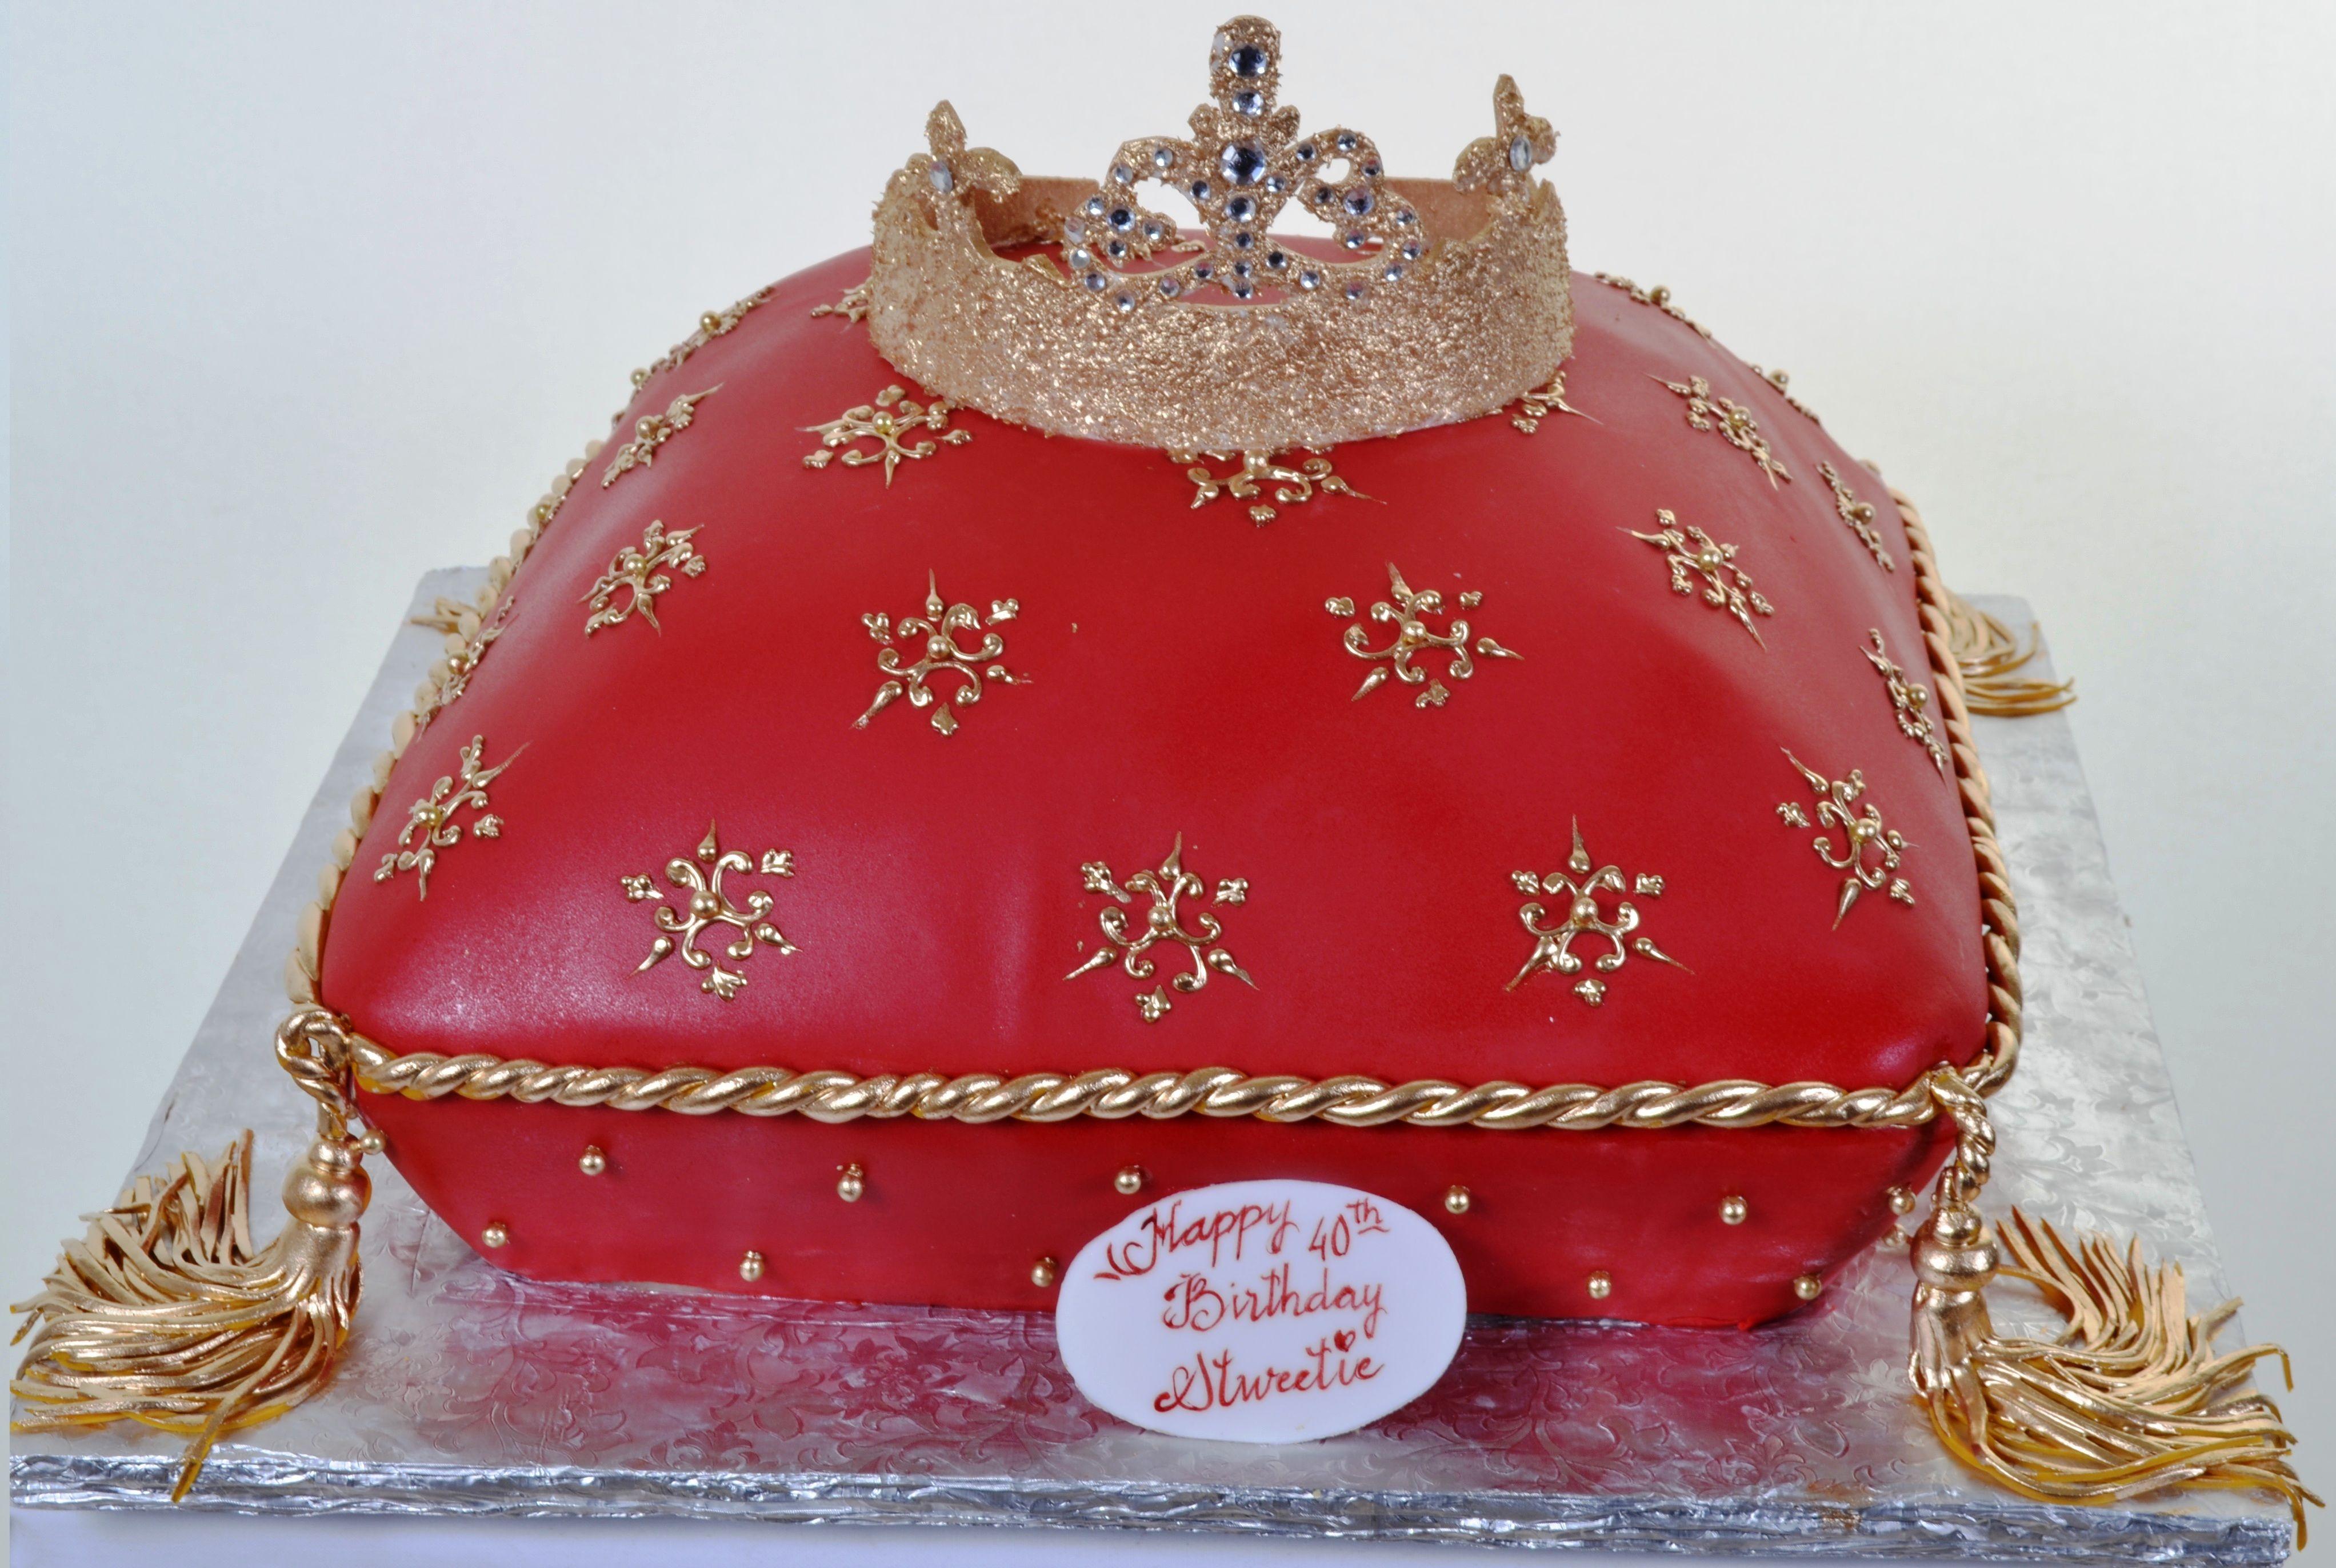 742 princess pillow bridal shower cakes las vegas